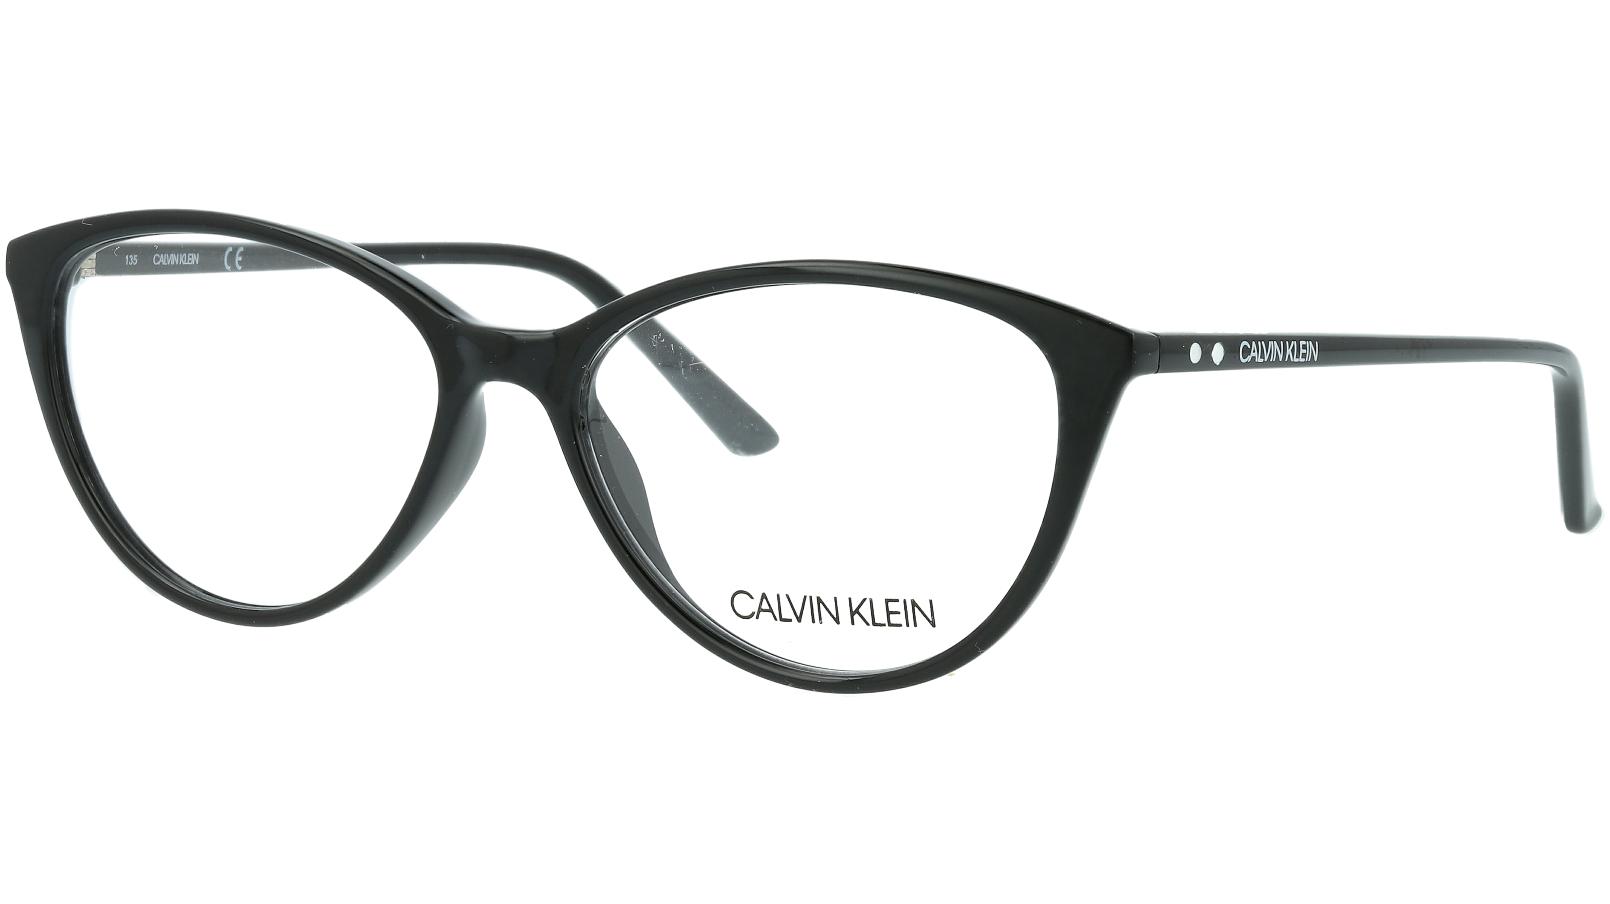 Calvin Klein CK18543 001 53 Black Glasses